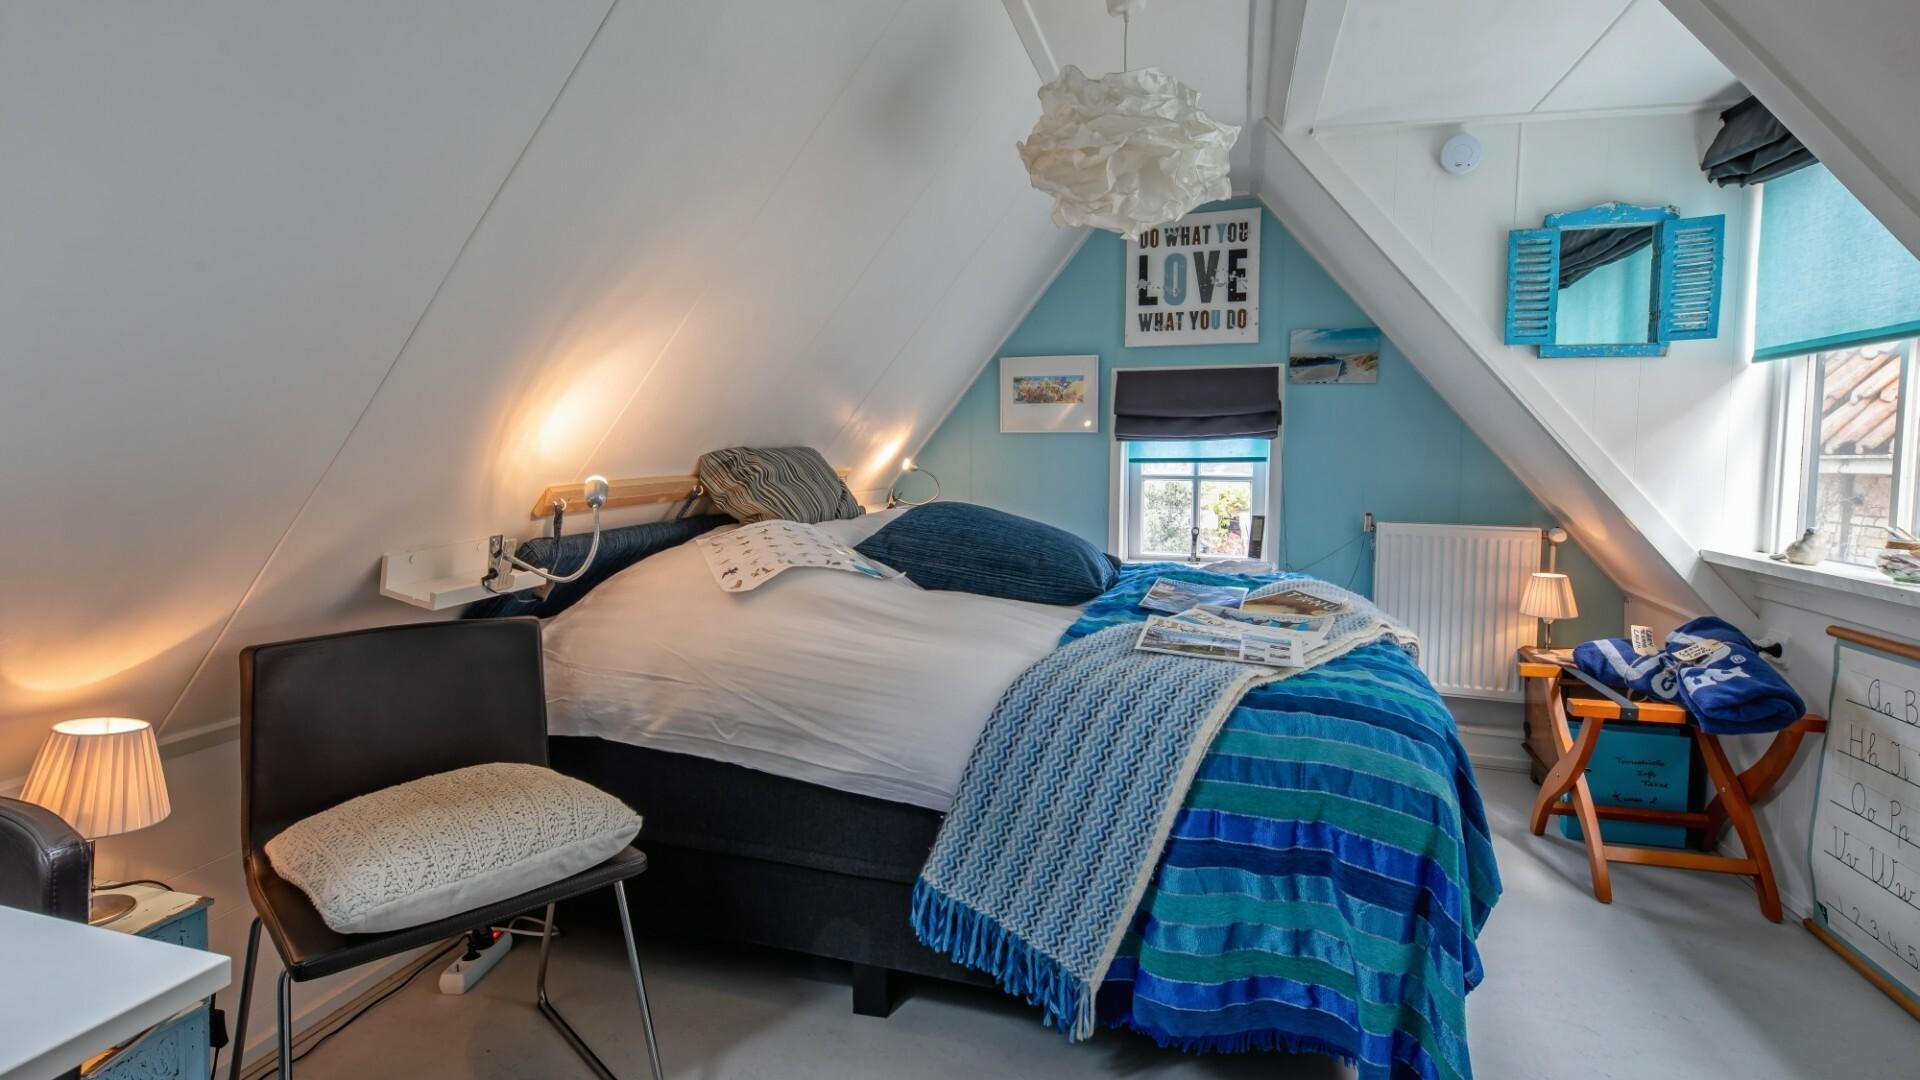 Slaapkamer Spookhuis Den Hoorn fotograaf Justin Sinner VVV Texel